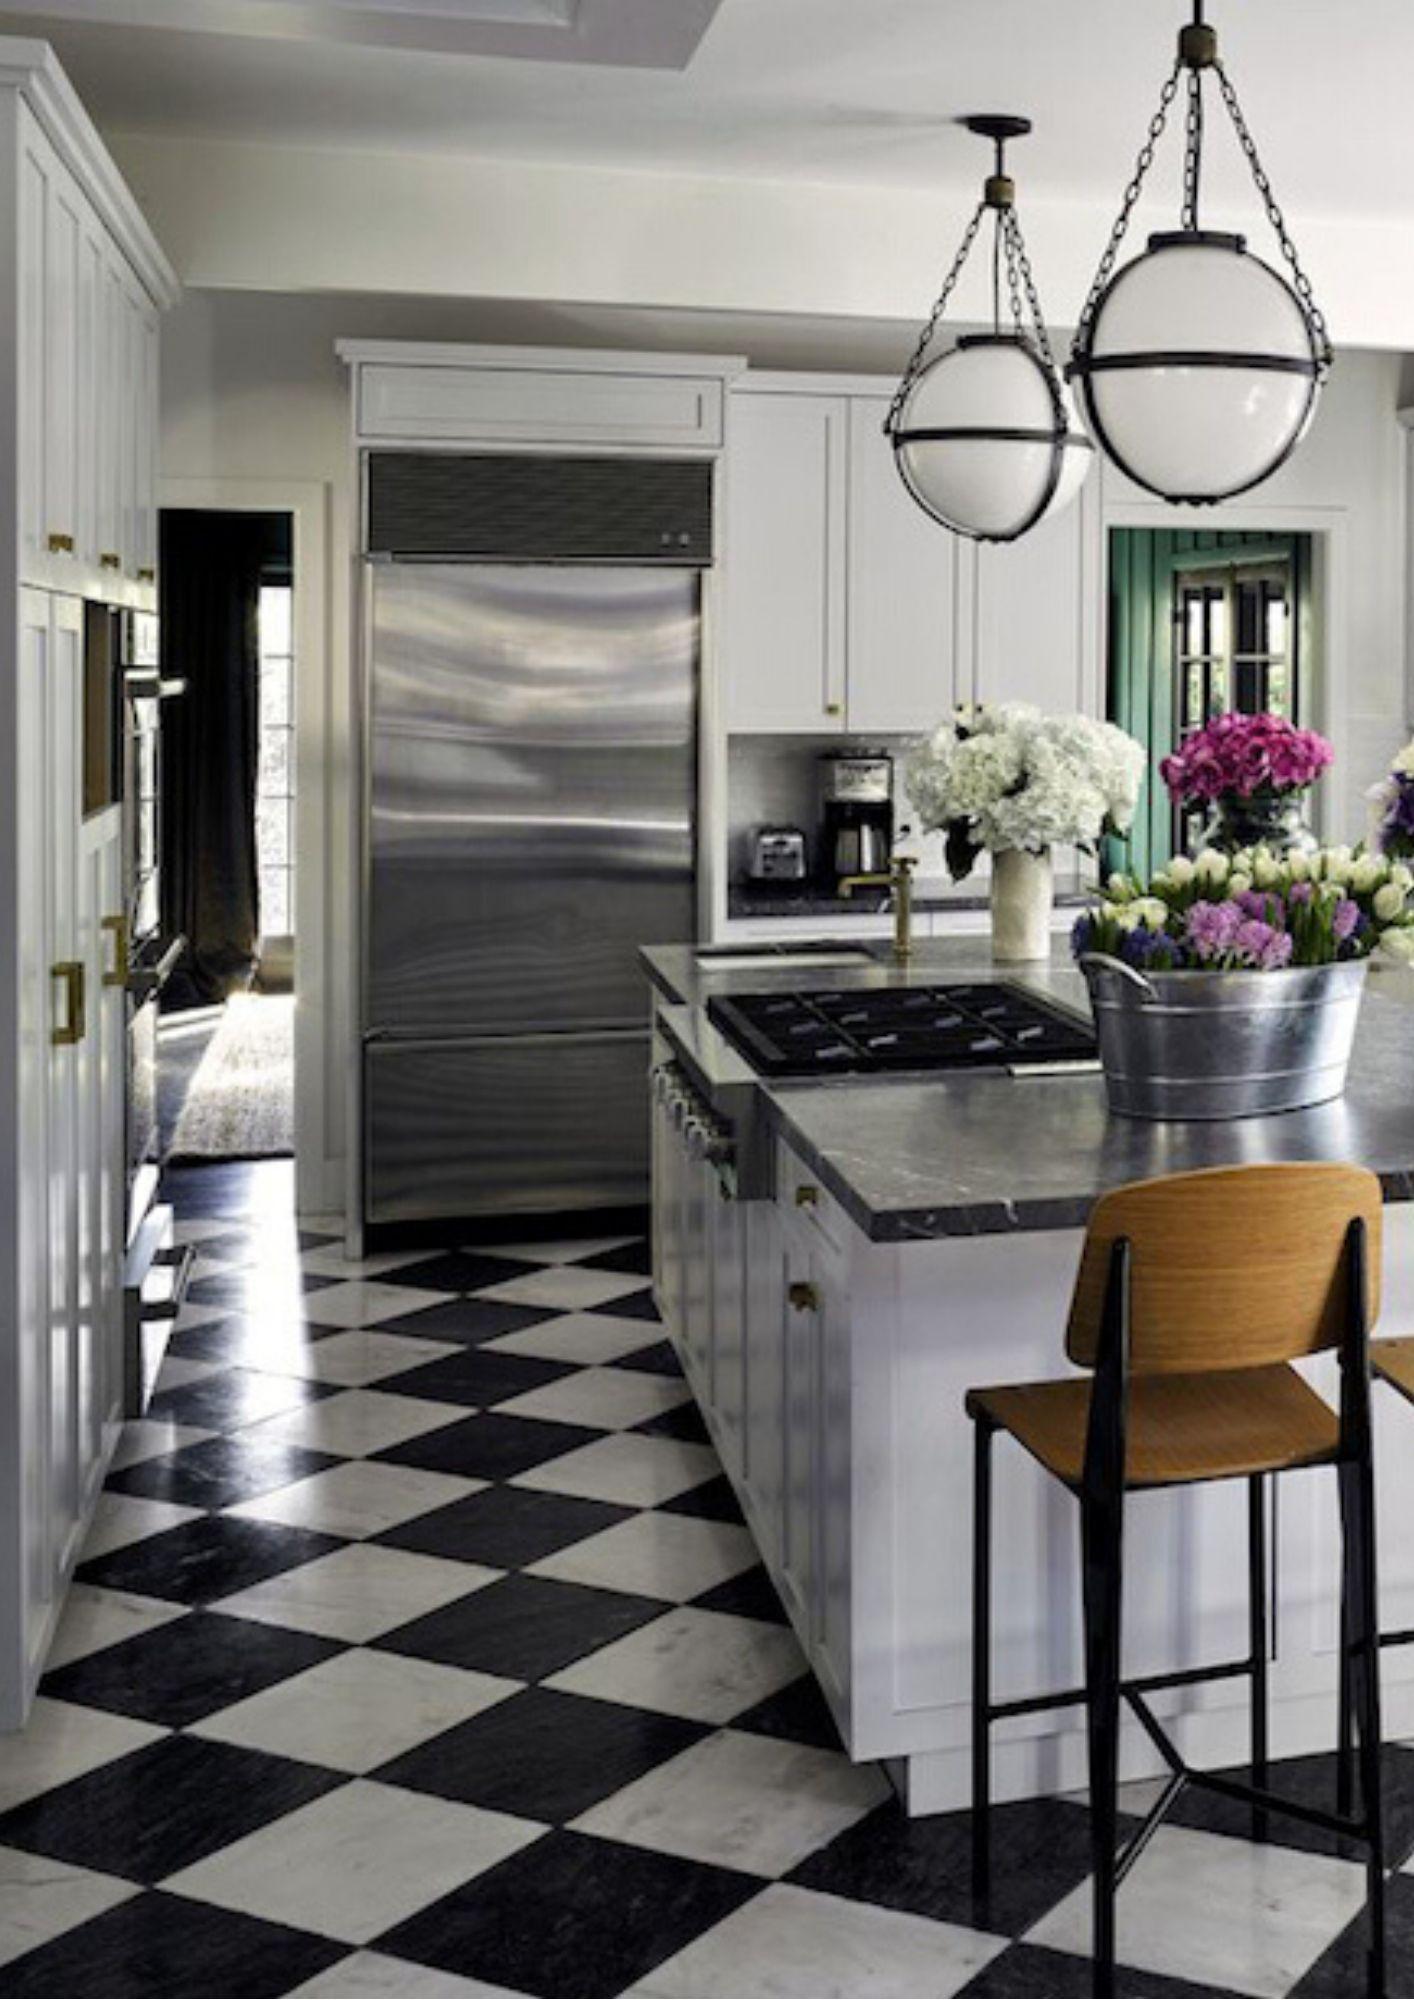 georgia tapert howe a source of design inspiration in 2020 design design inspiration on kitchen interior top view id=87135